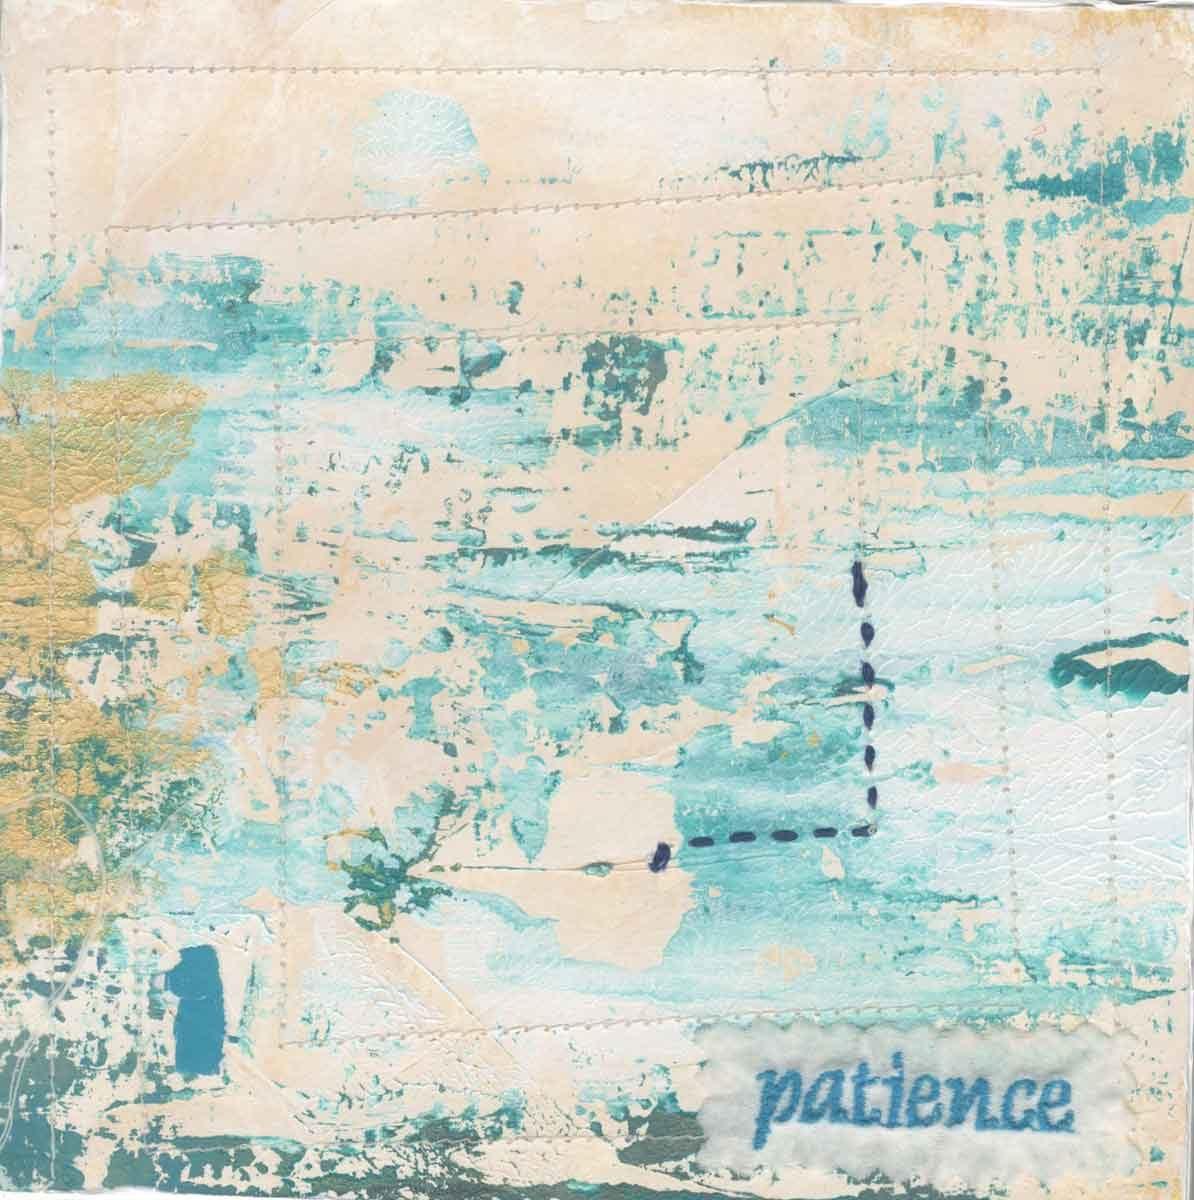 "patience, 6"" x 6"" x ¾,"" Nan Genger, 2016"